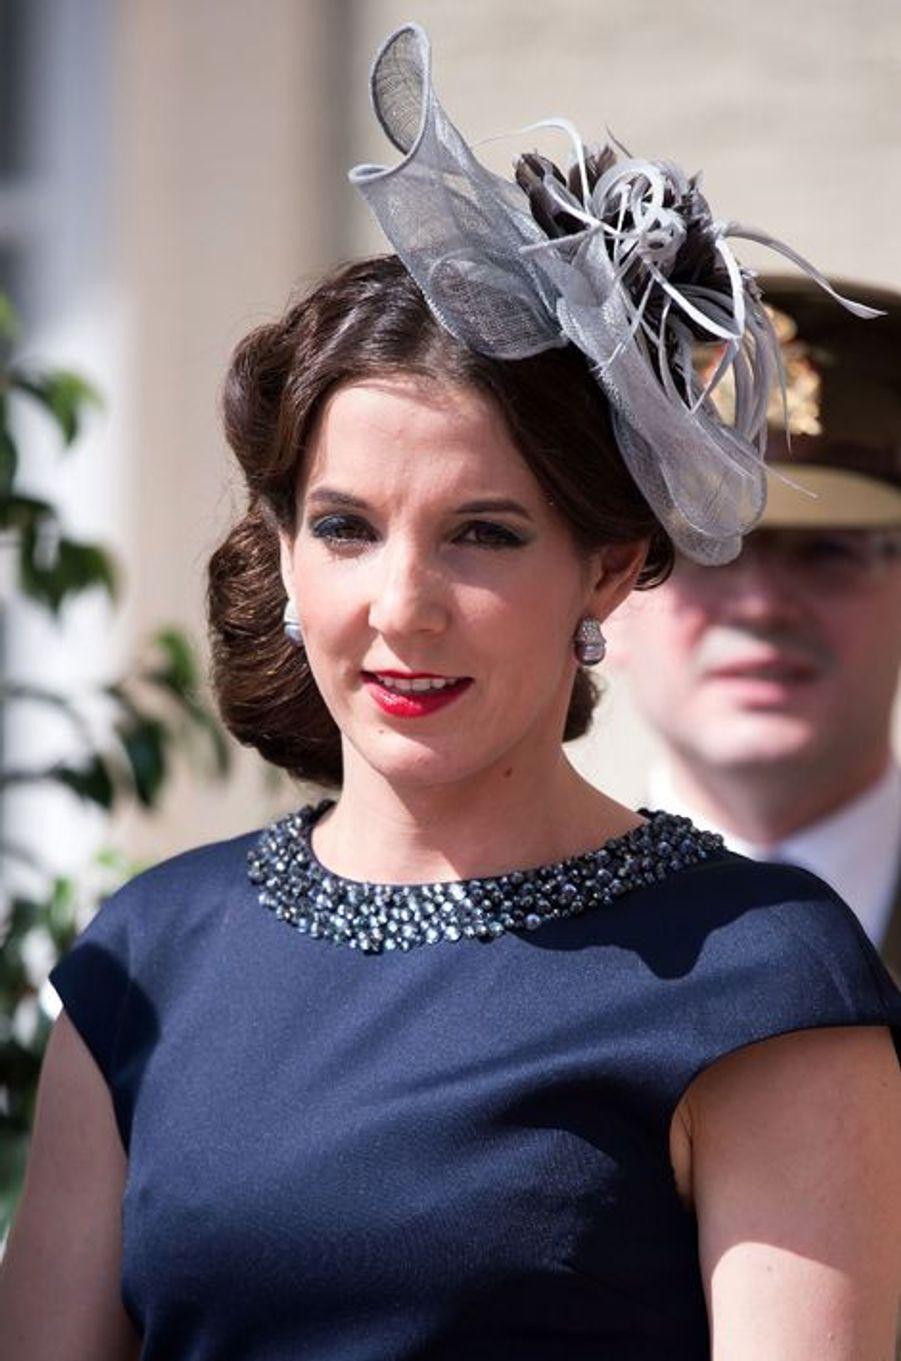 La princesse Tessy à Luxembourg, le 23 juin 2015